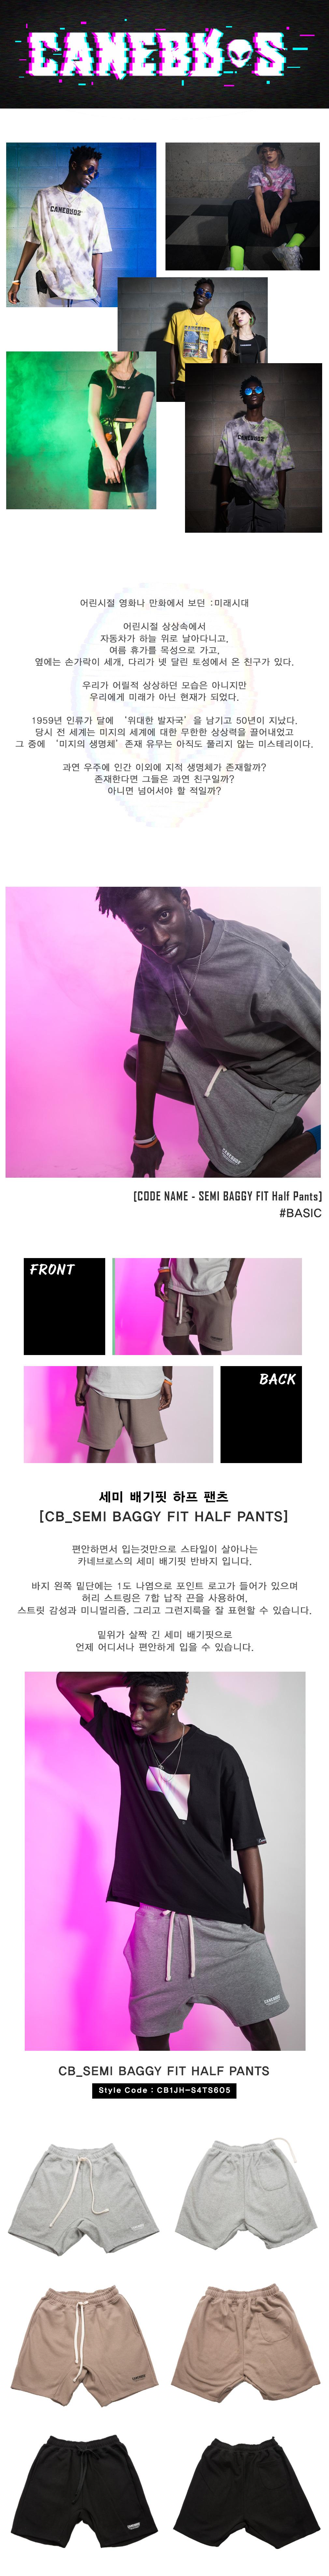 SEMI-BAGGY-FIT_HALF_PANTS_01.jpg